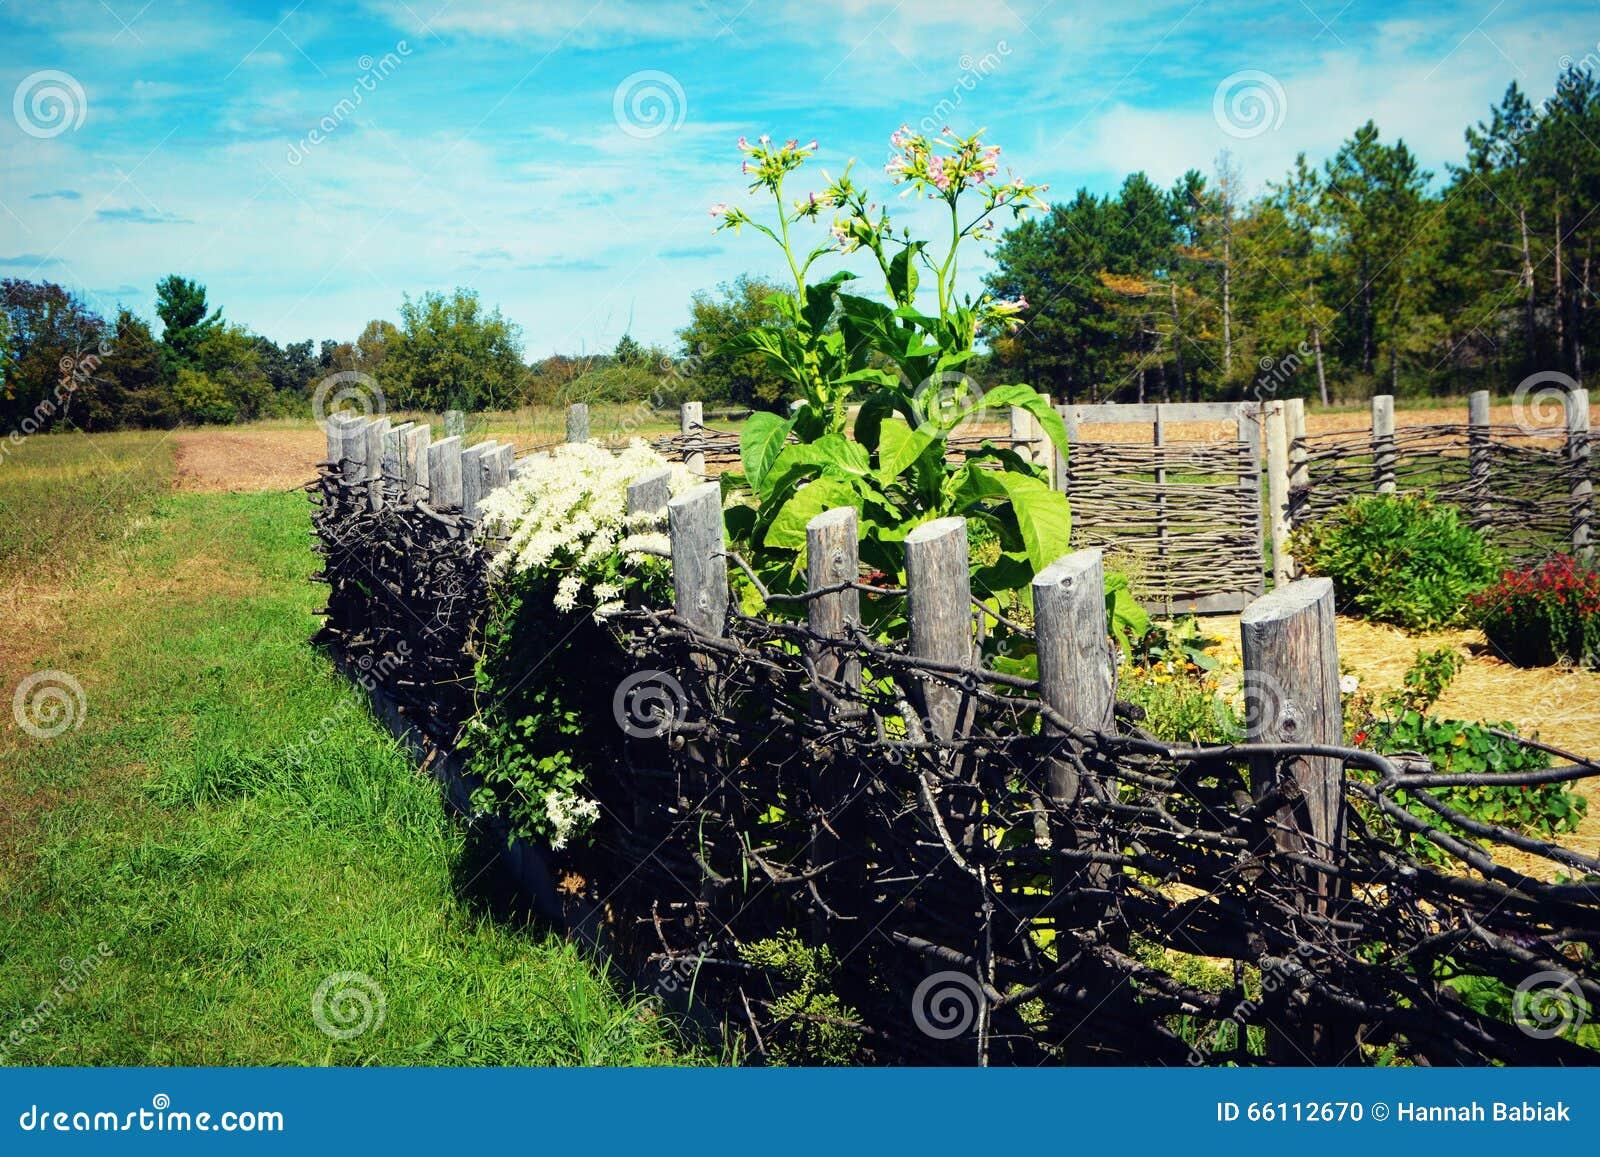 Homemade Fence stock photo  Image of gardening, garden